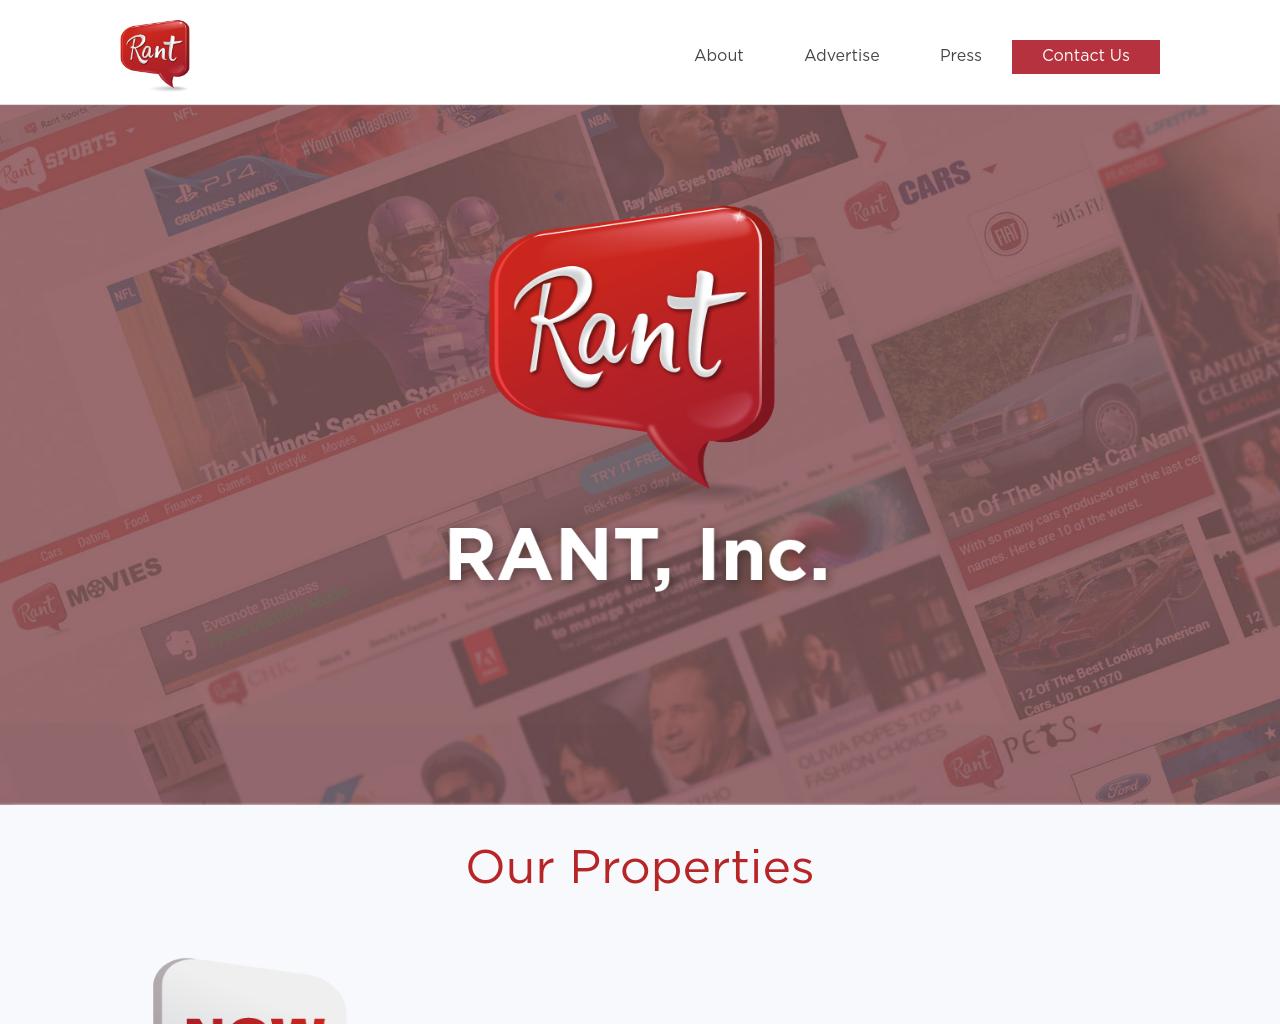 RantFinance-Advertising-Reviews-Pricing